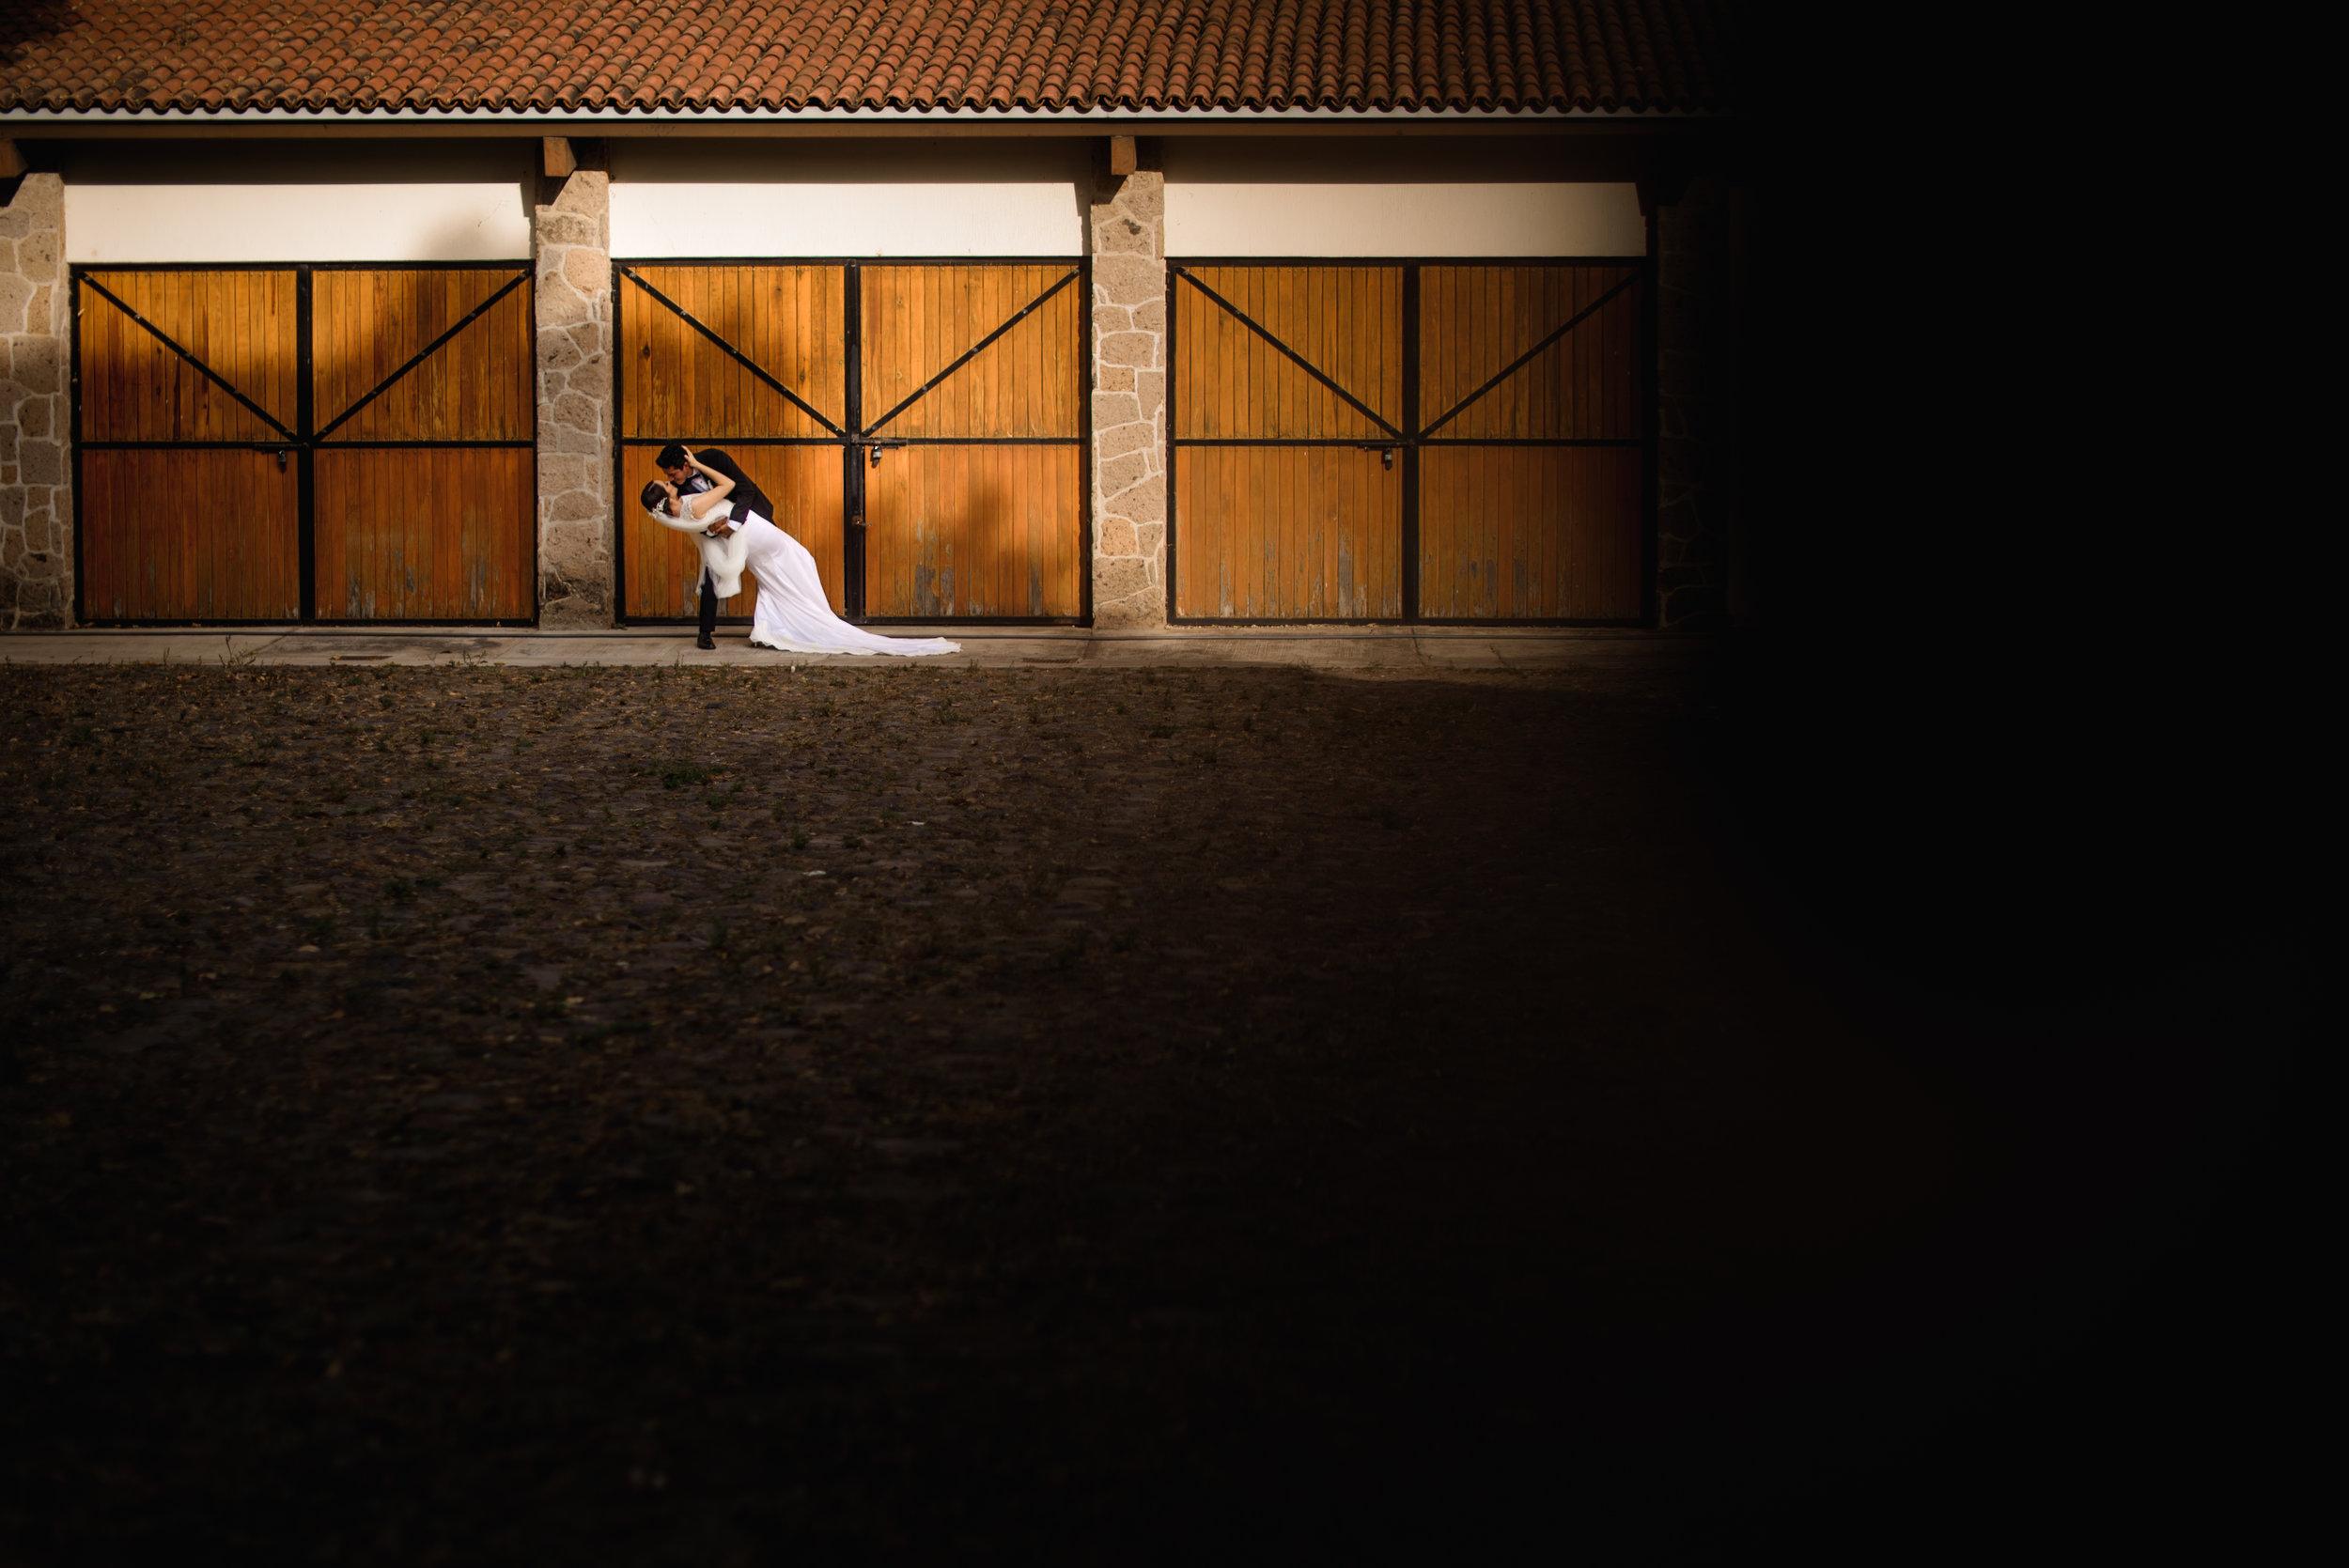 Hacienda fotografo bodas guadalajara jalisco tequila magali espinosa wedding photography.jpg